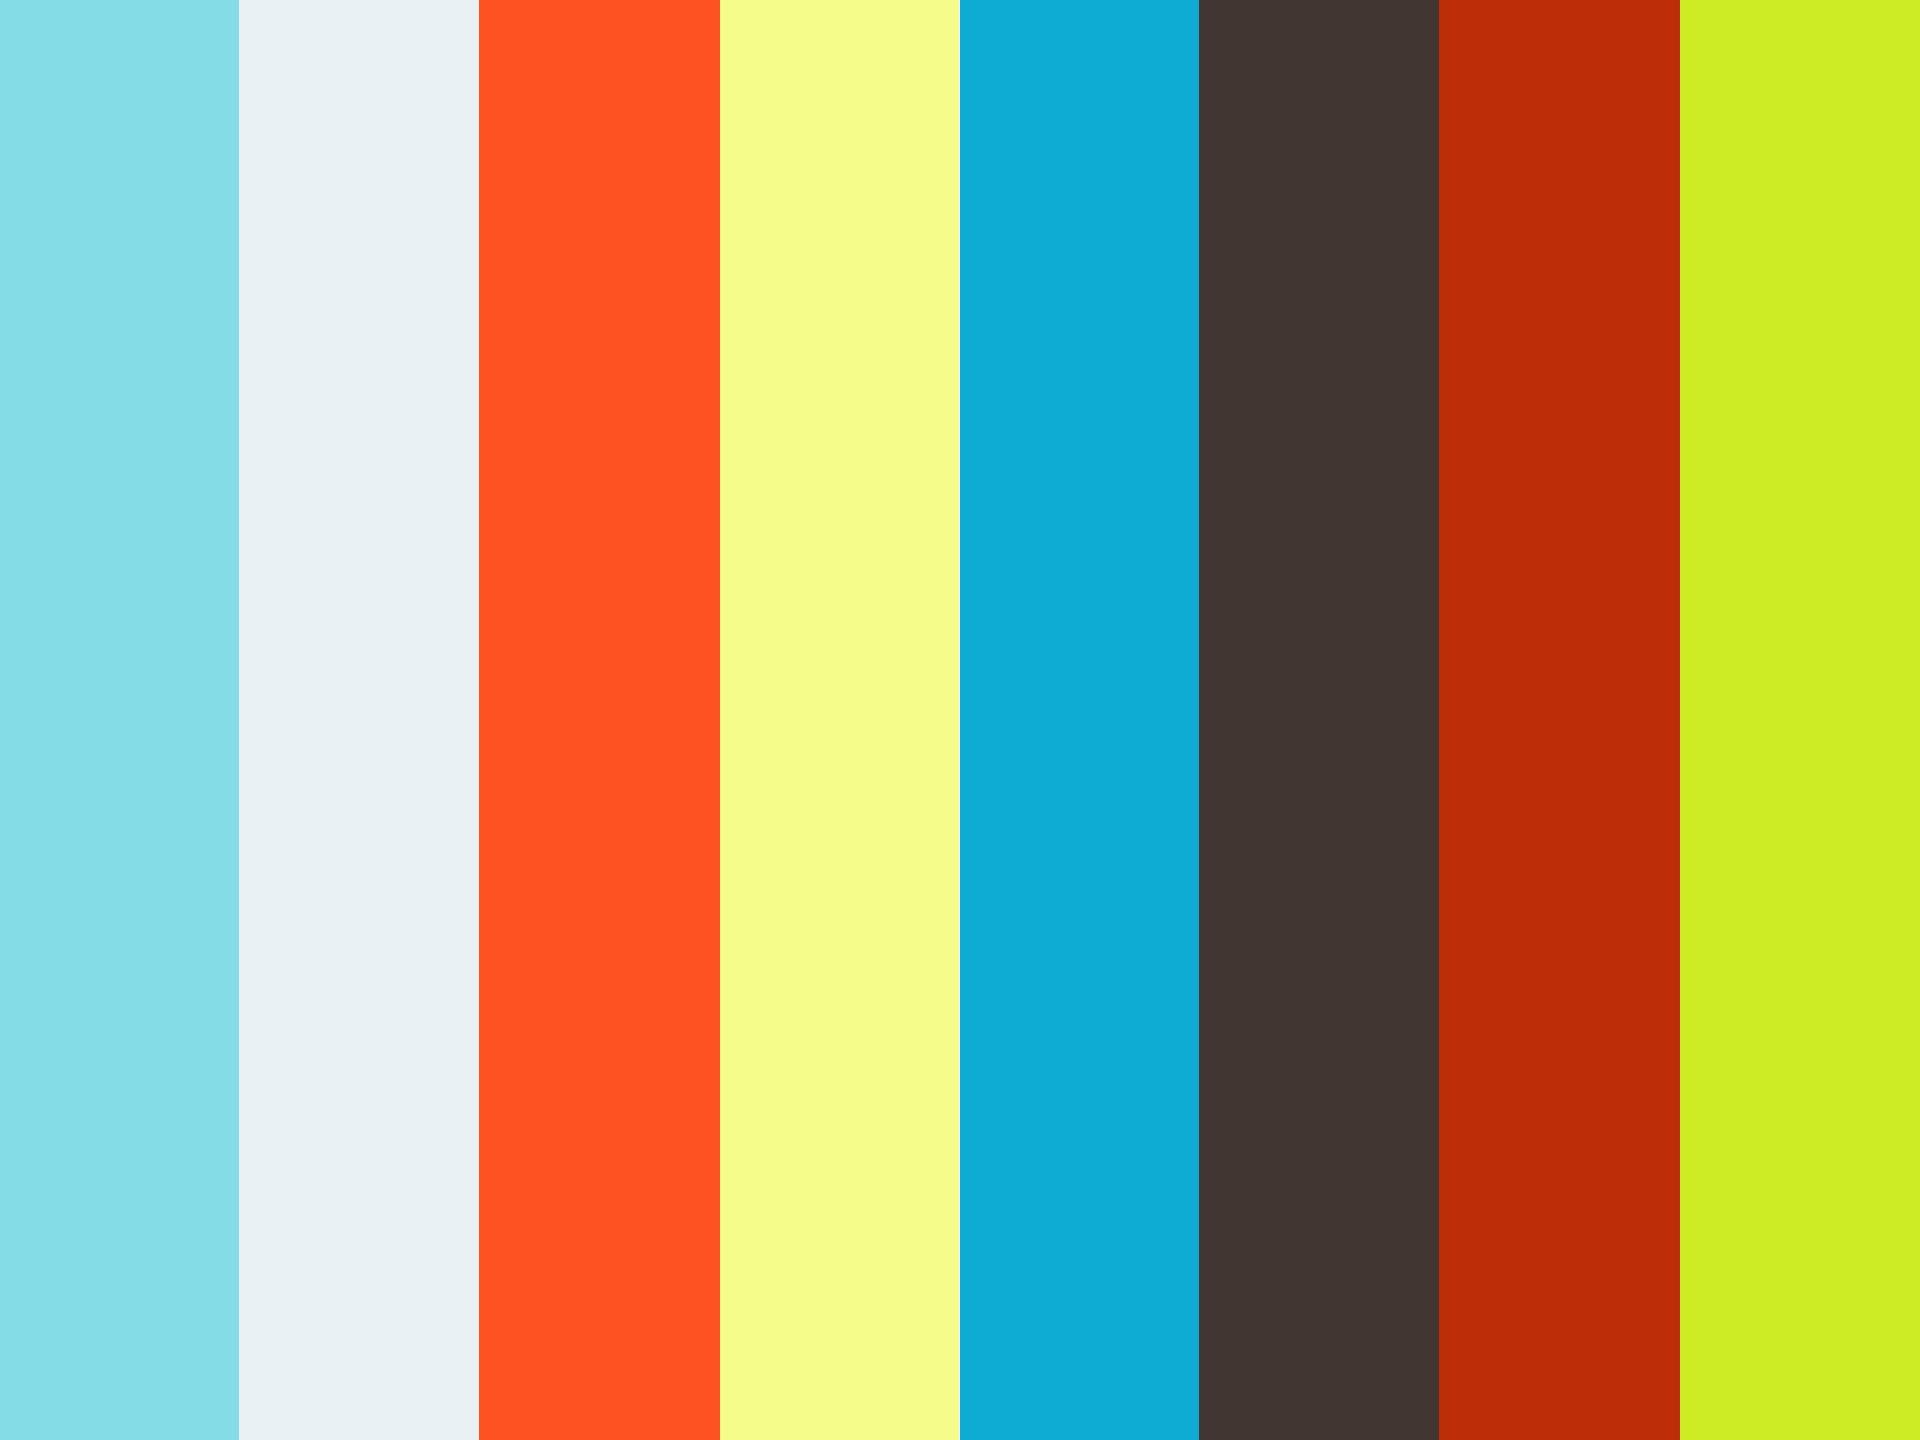 randstad rapport soci u00e9tal 2017  on vimeo